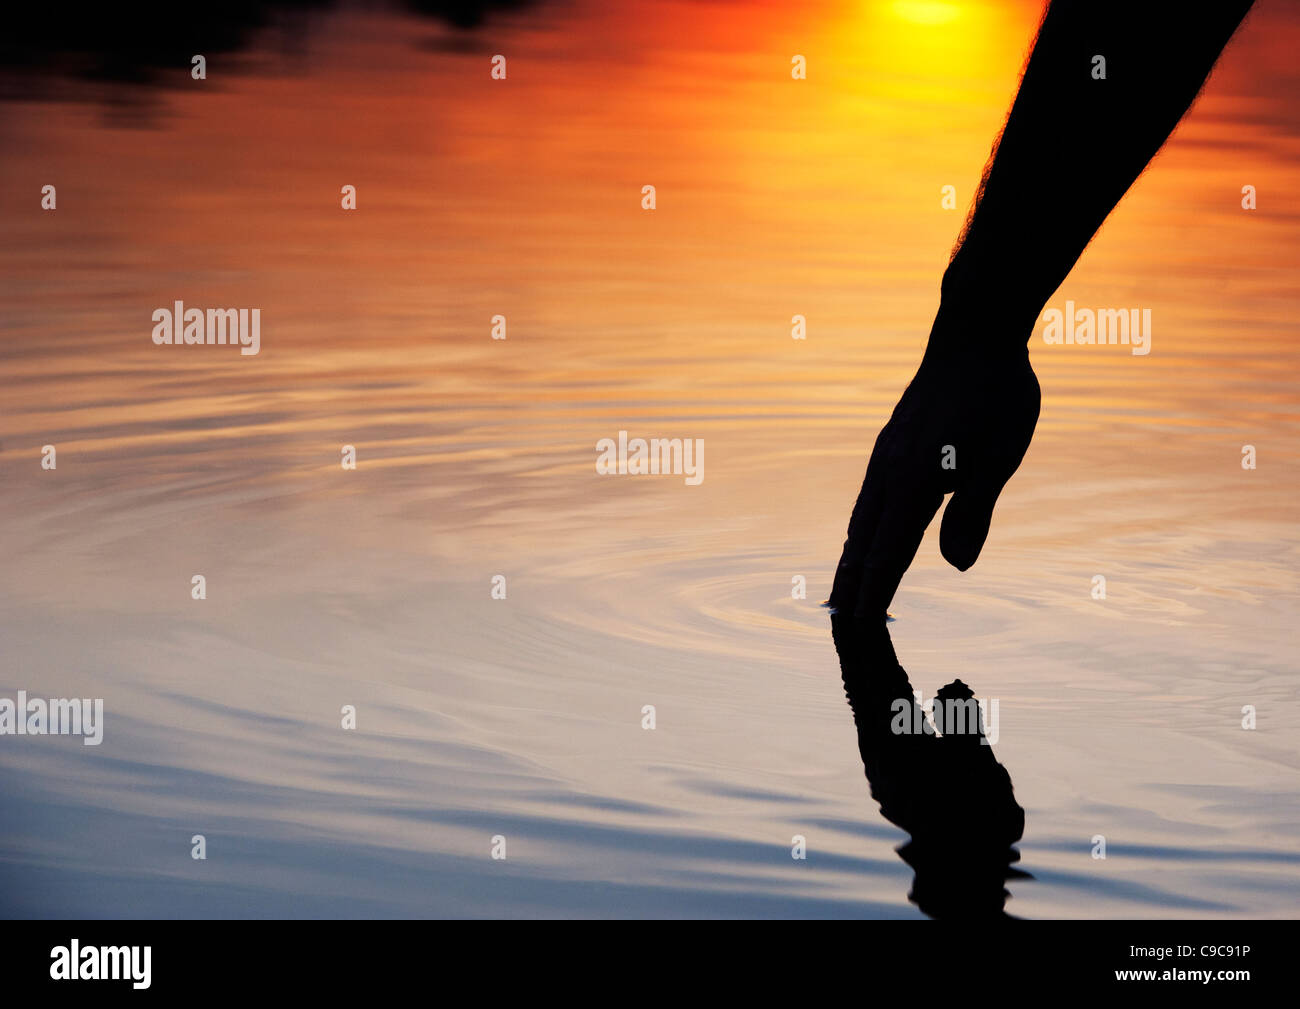 Hand touching water causing ripple at sunrise silhouette. India - Stock Image